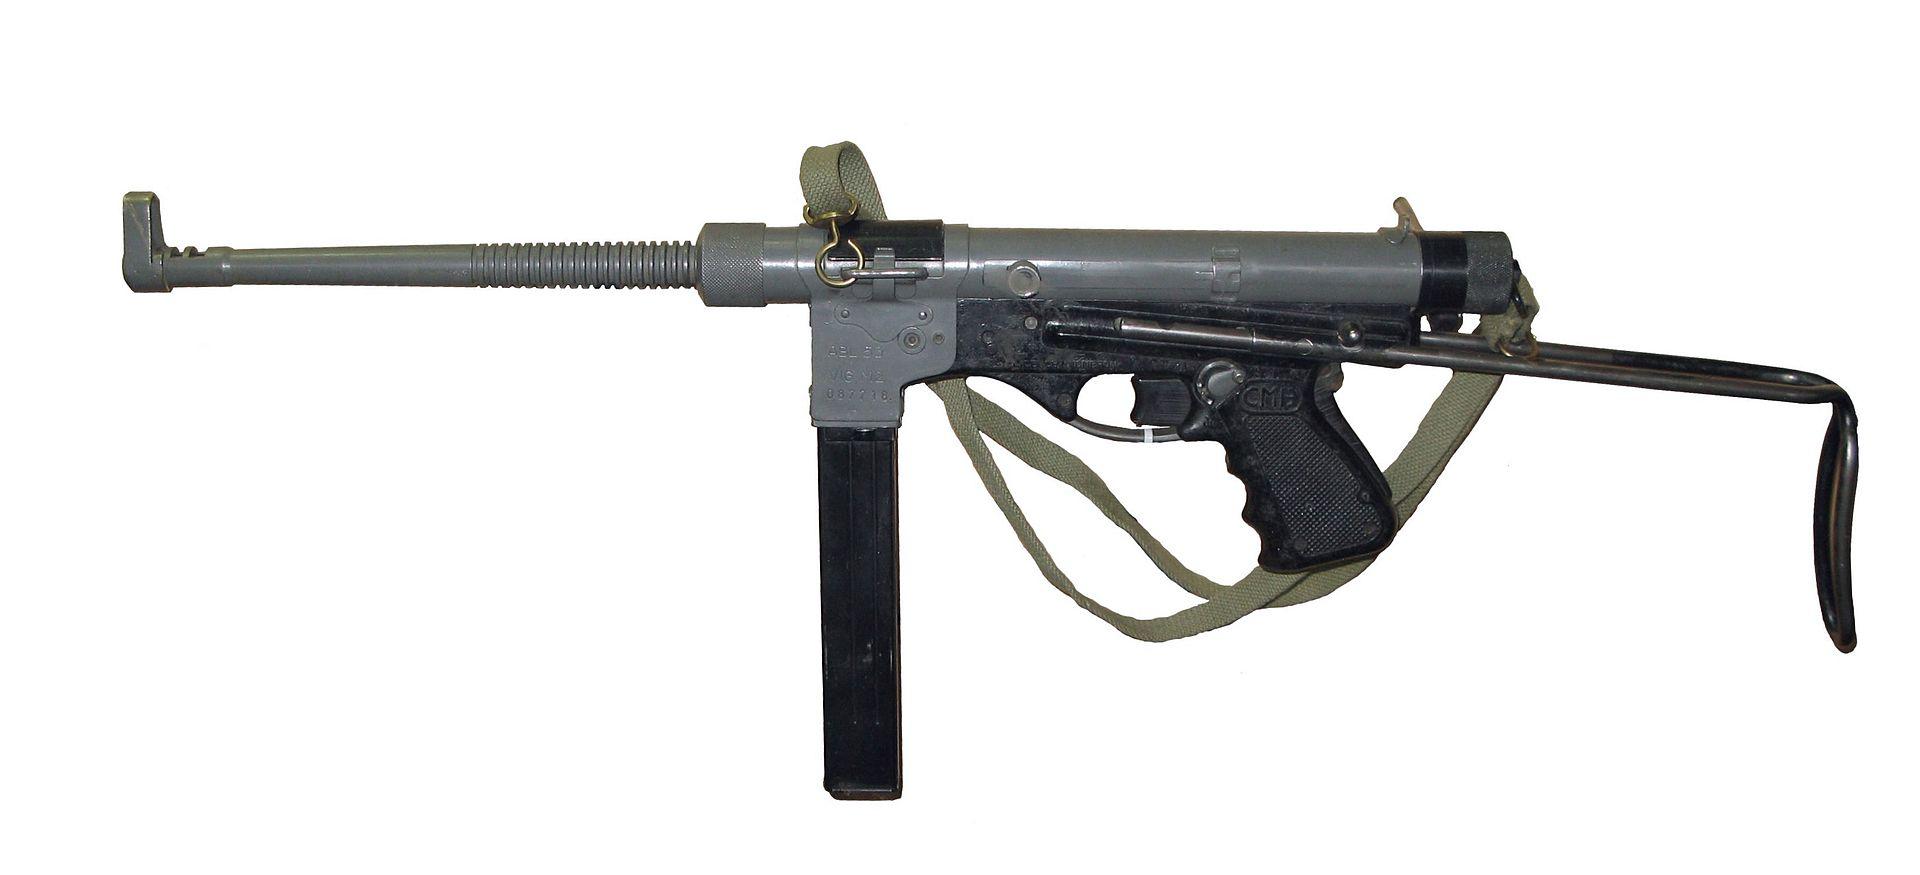 Belgium's Vigneron Submachine Gun—A Gun That Took The Best ...